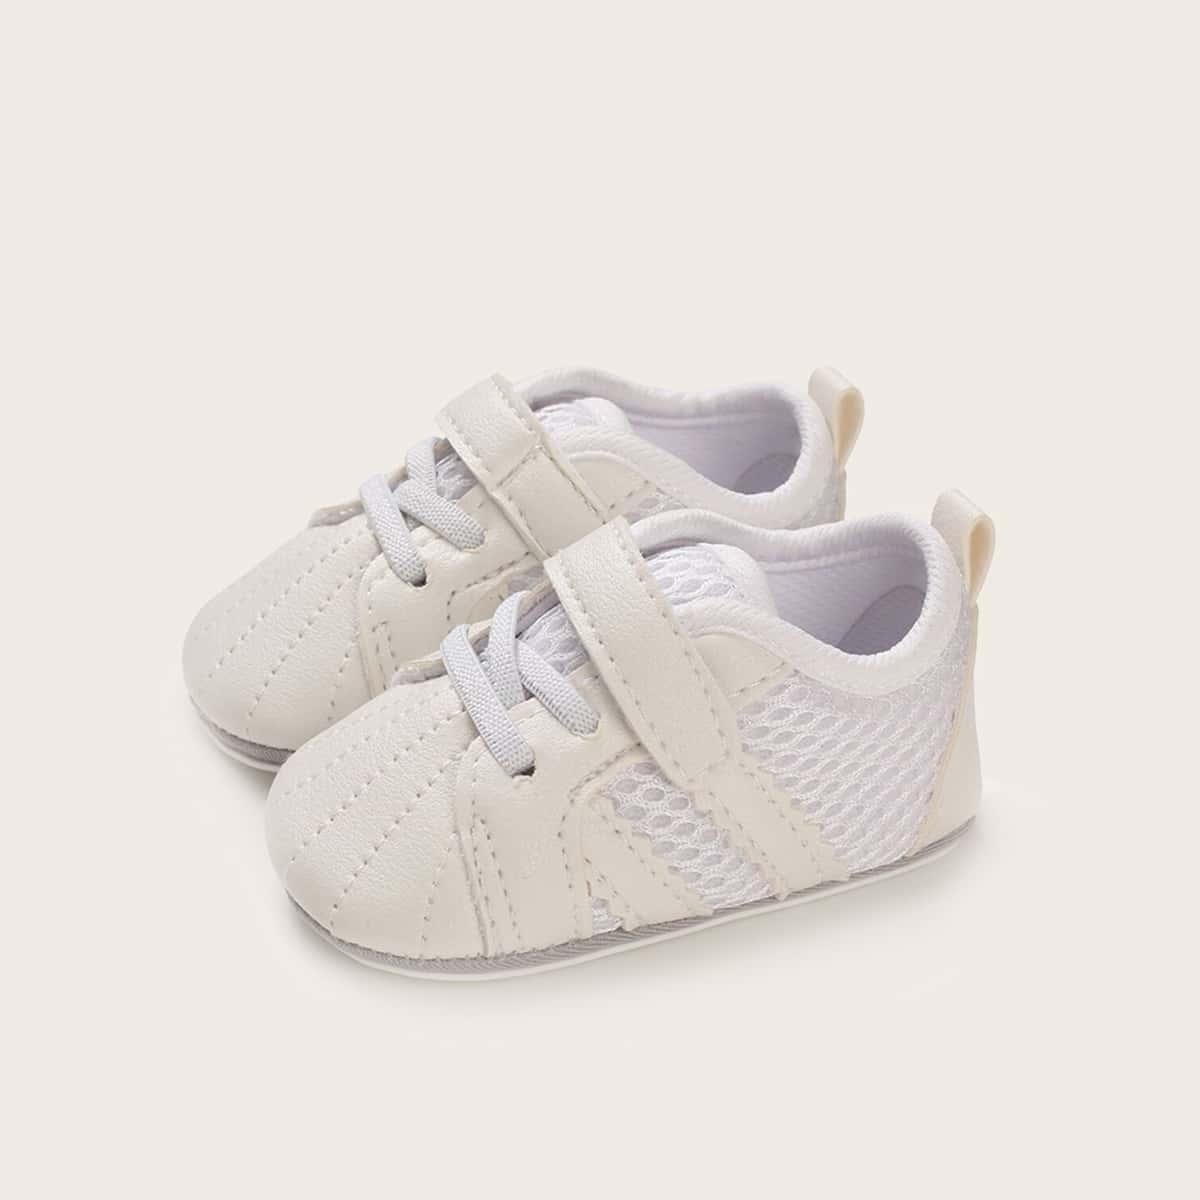 shein Vlak Baby sneaker Kant